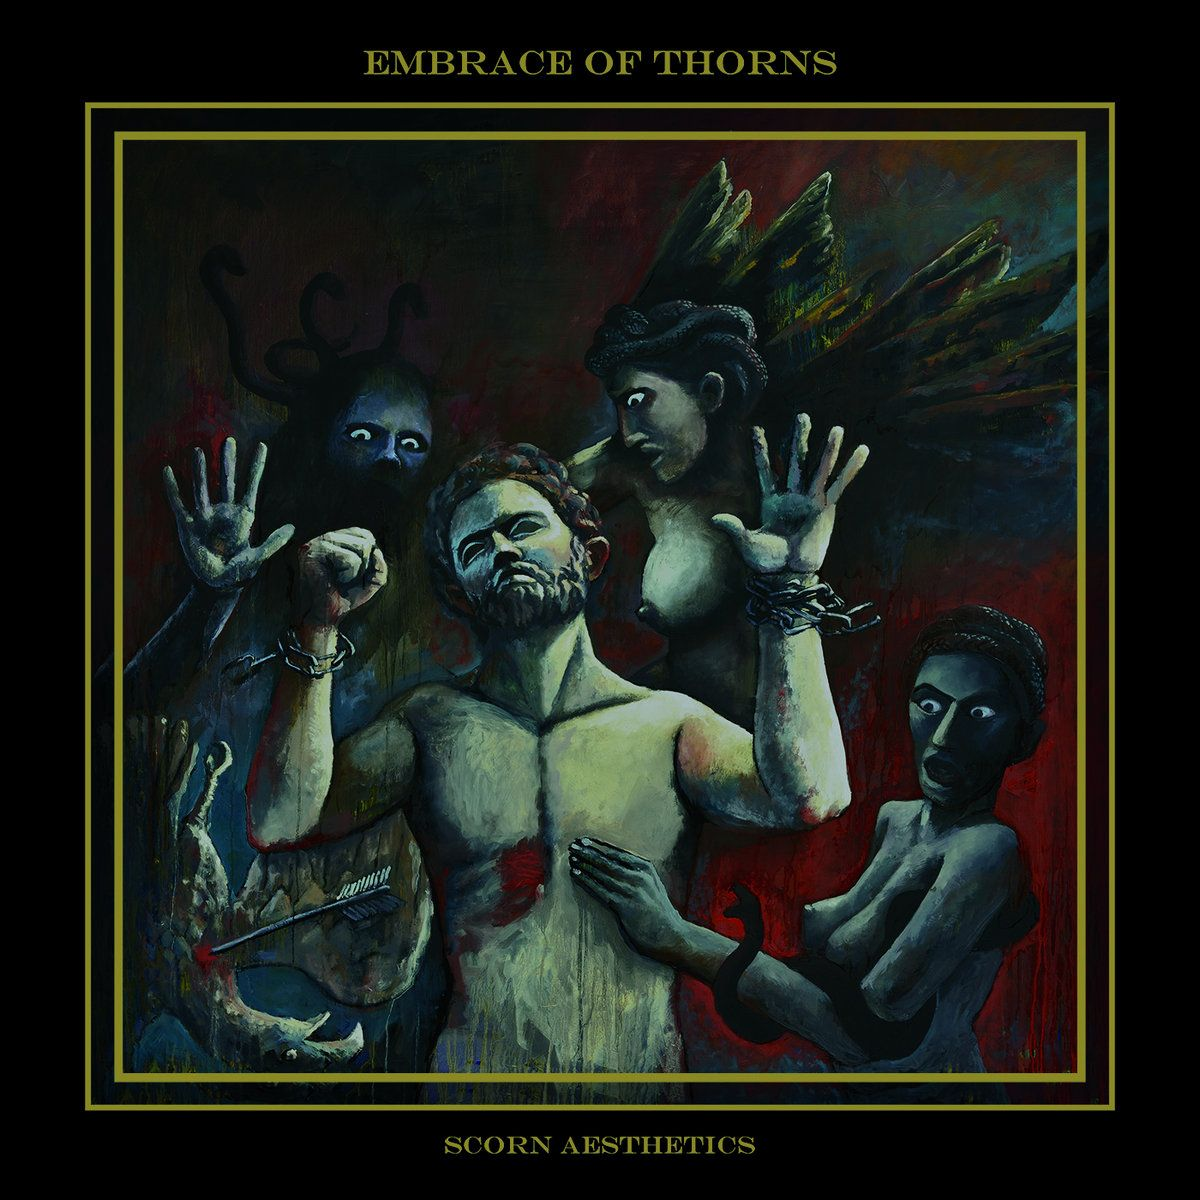 Embrace of Thorns - Scorn Aesthetics